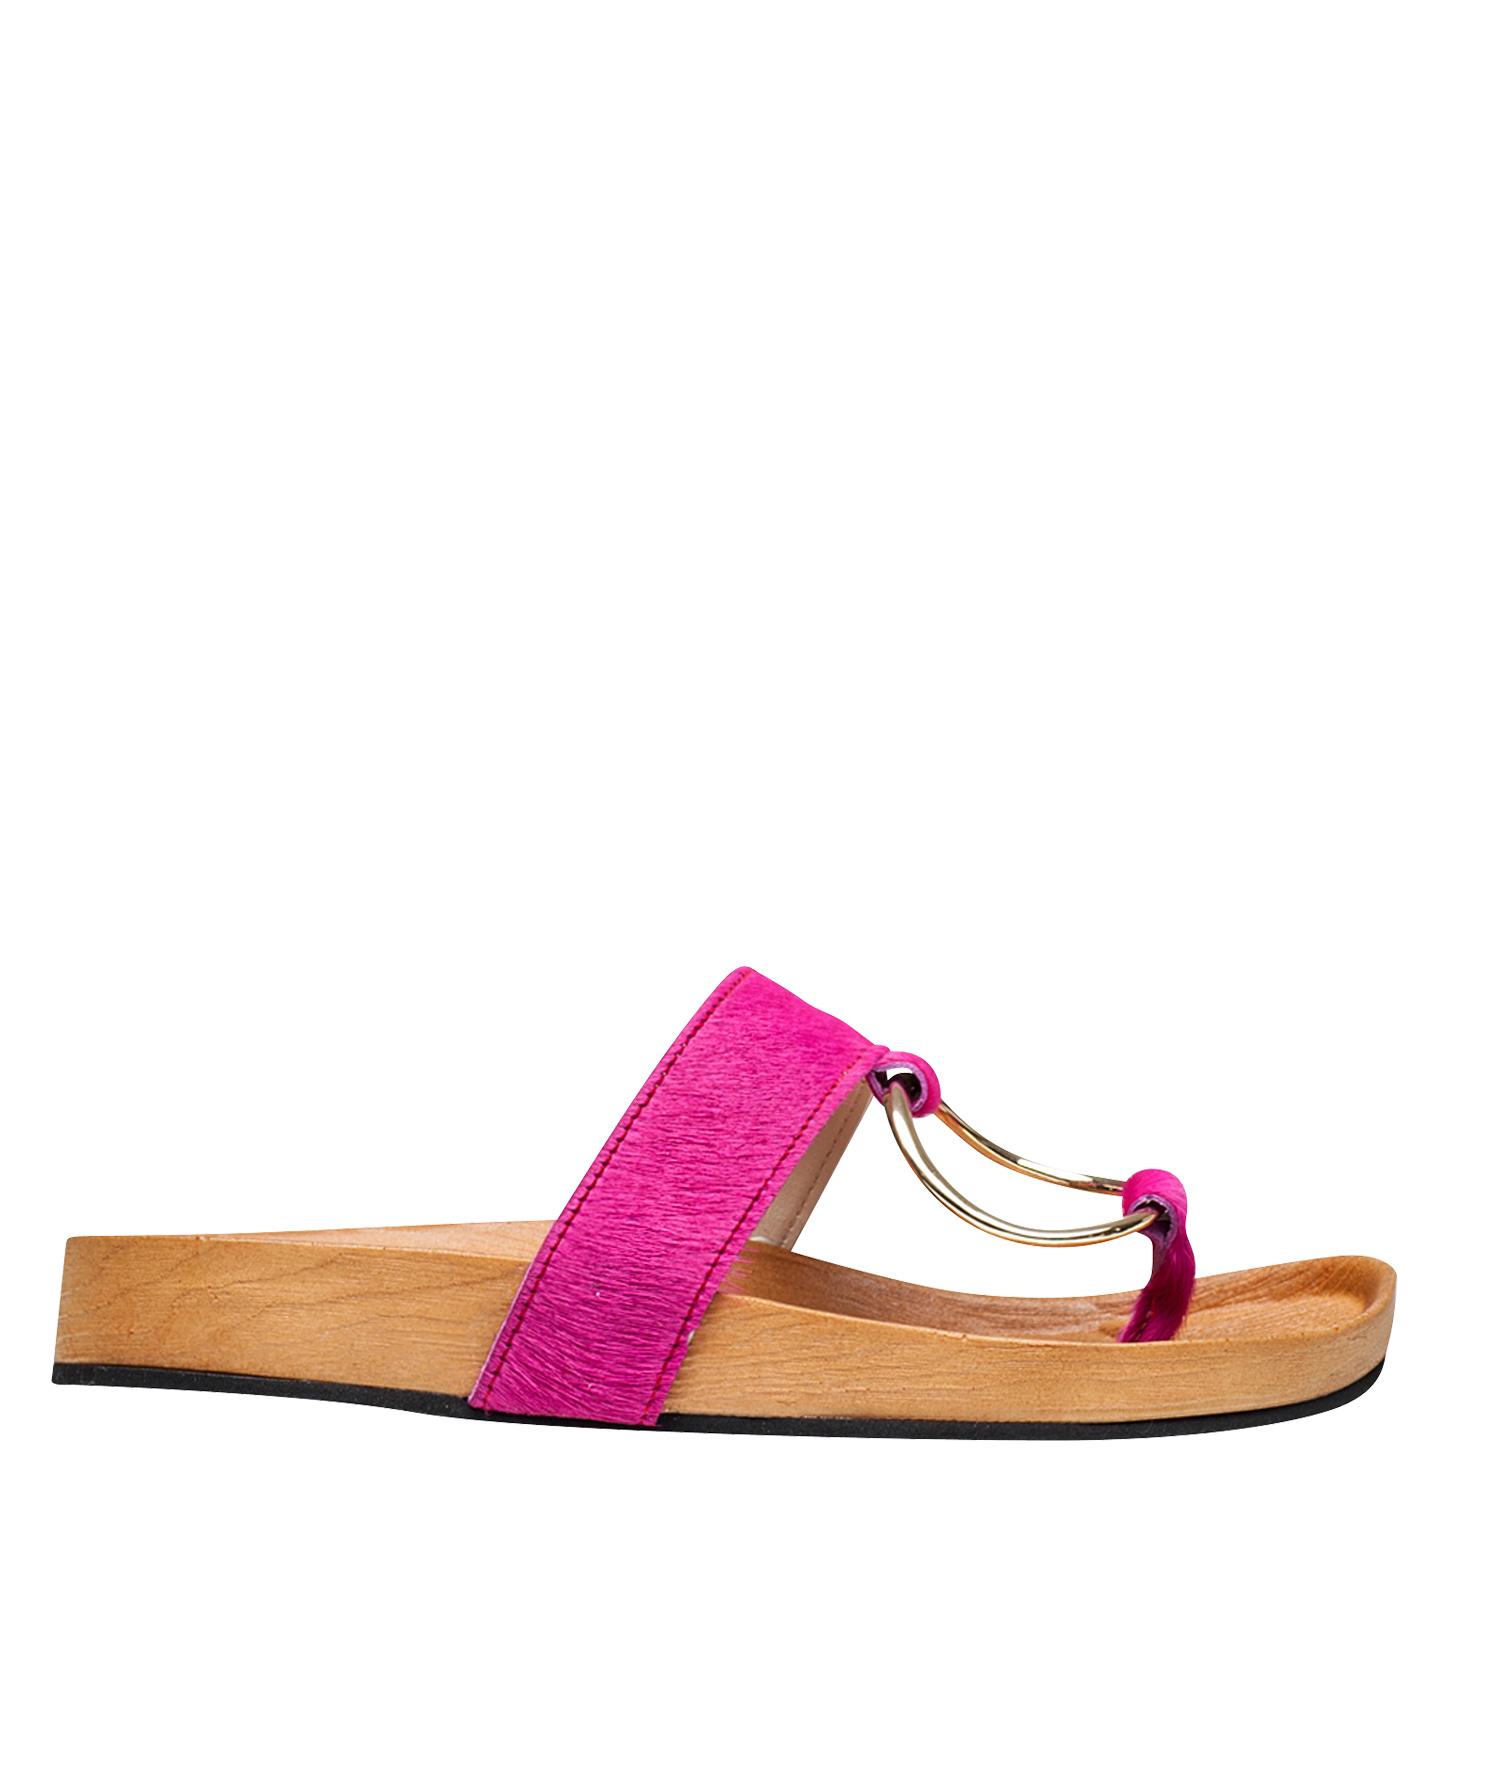 2fd1c8c99 AnnaKastle Womens Calf Hair Ring Thong Sandal Slide Flip Flops Pink